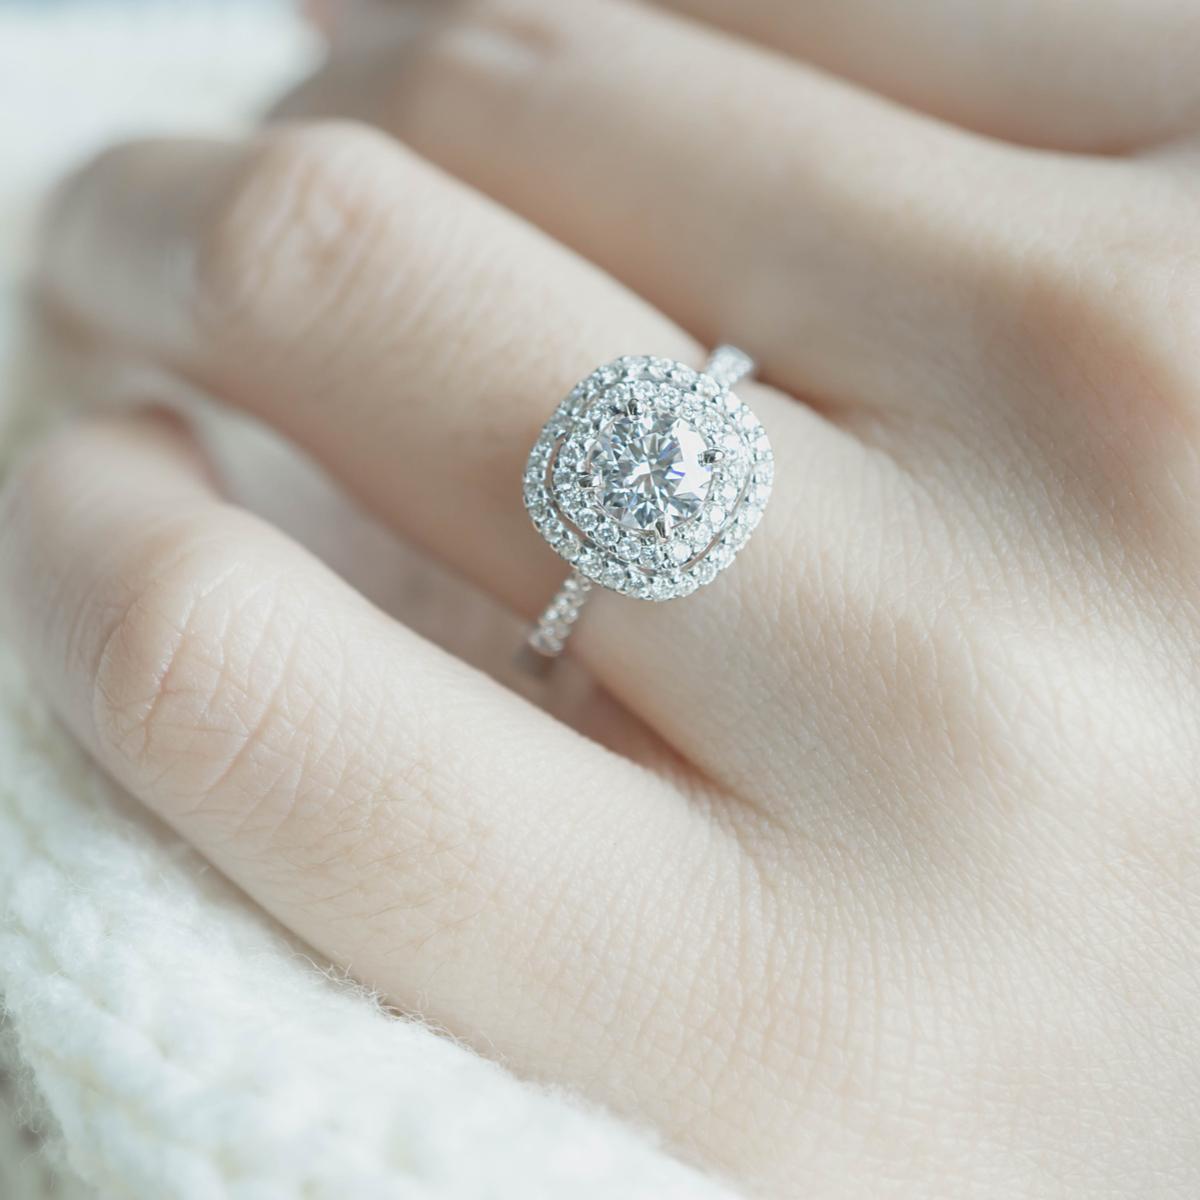 WOMAN, HAND, DIAMOND